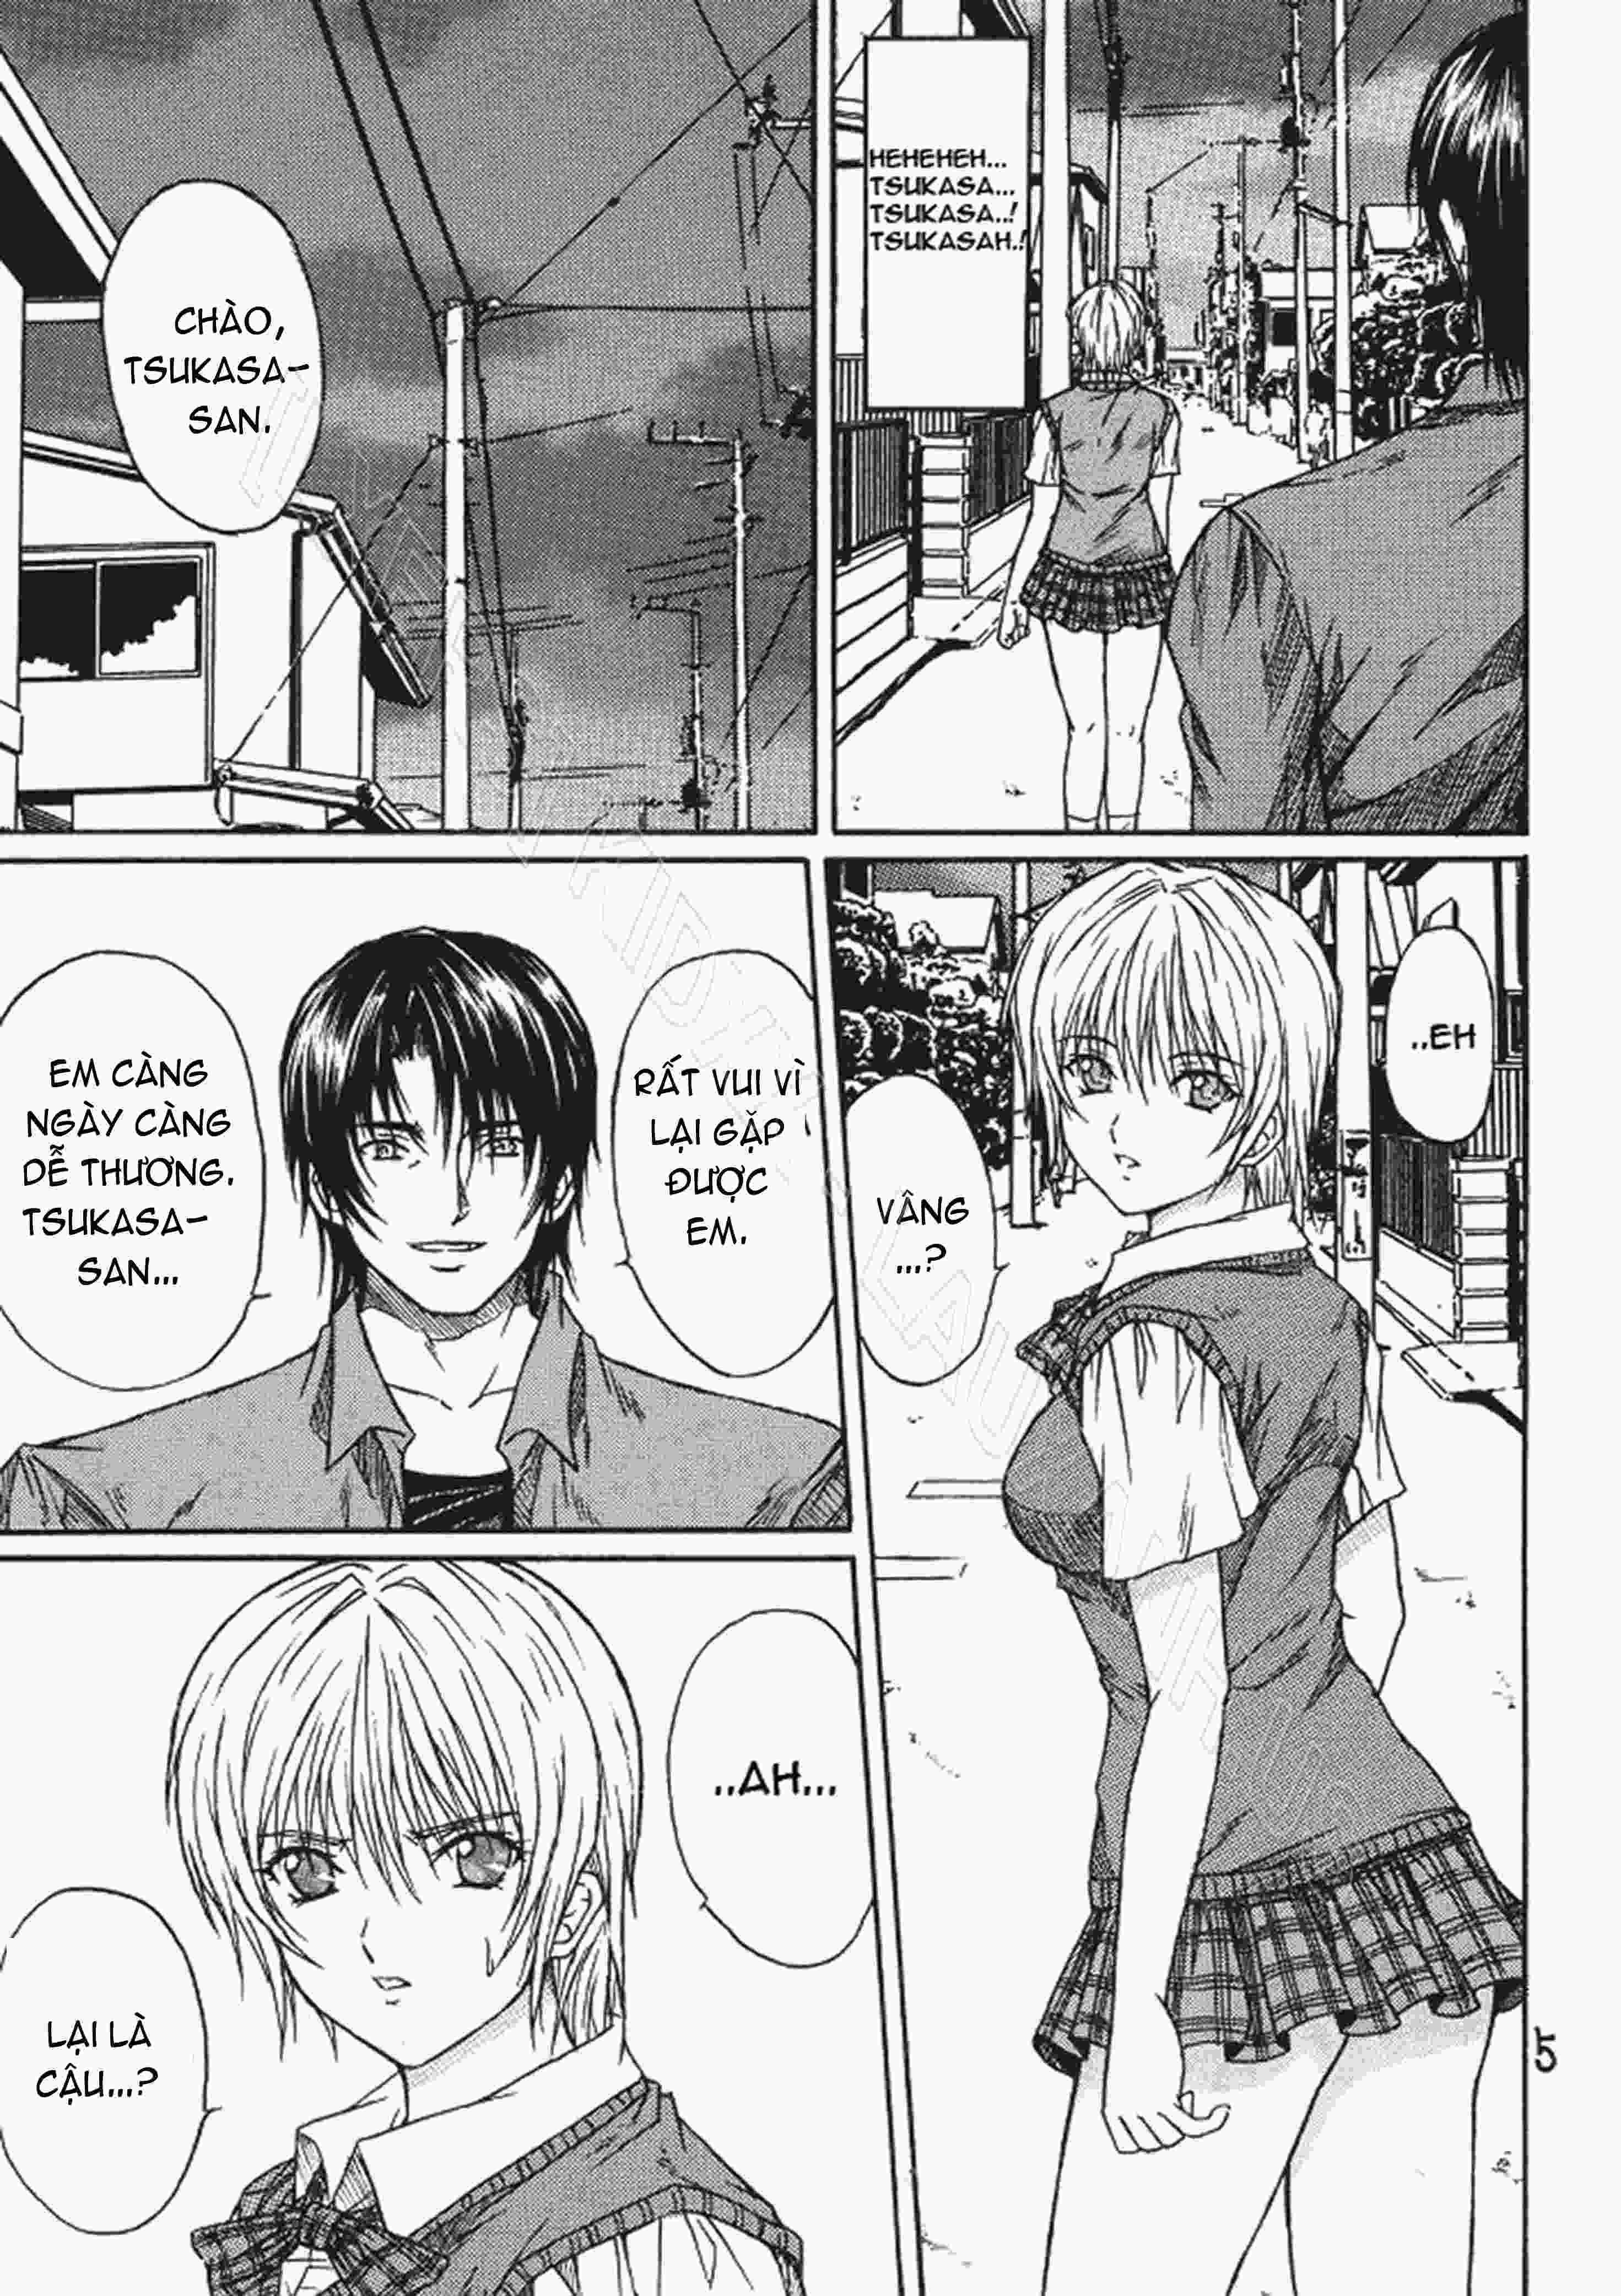 TruyenHay.Com - Ảnh 4 - Ryoujoku Rensa Chapter 3